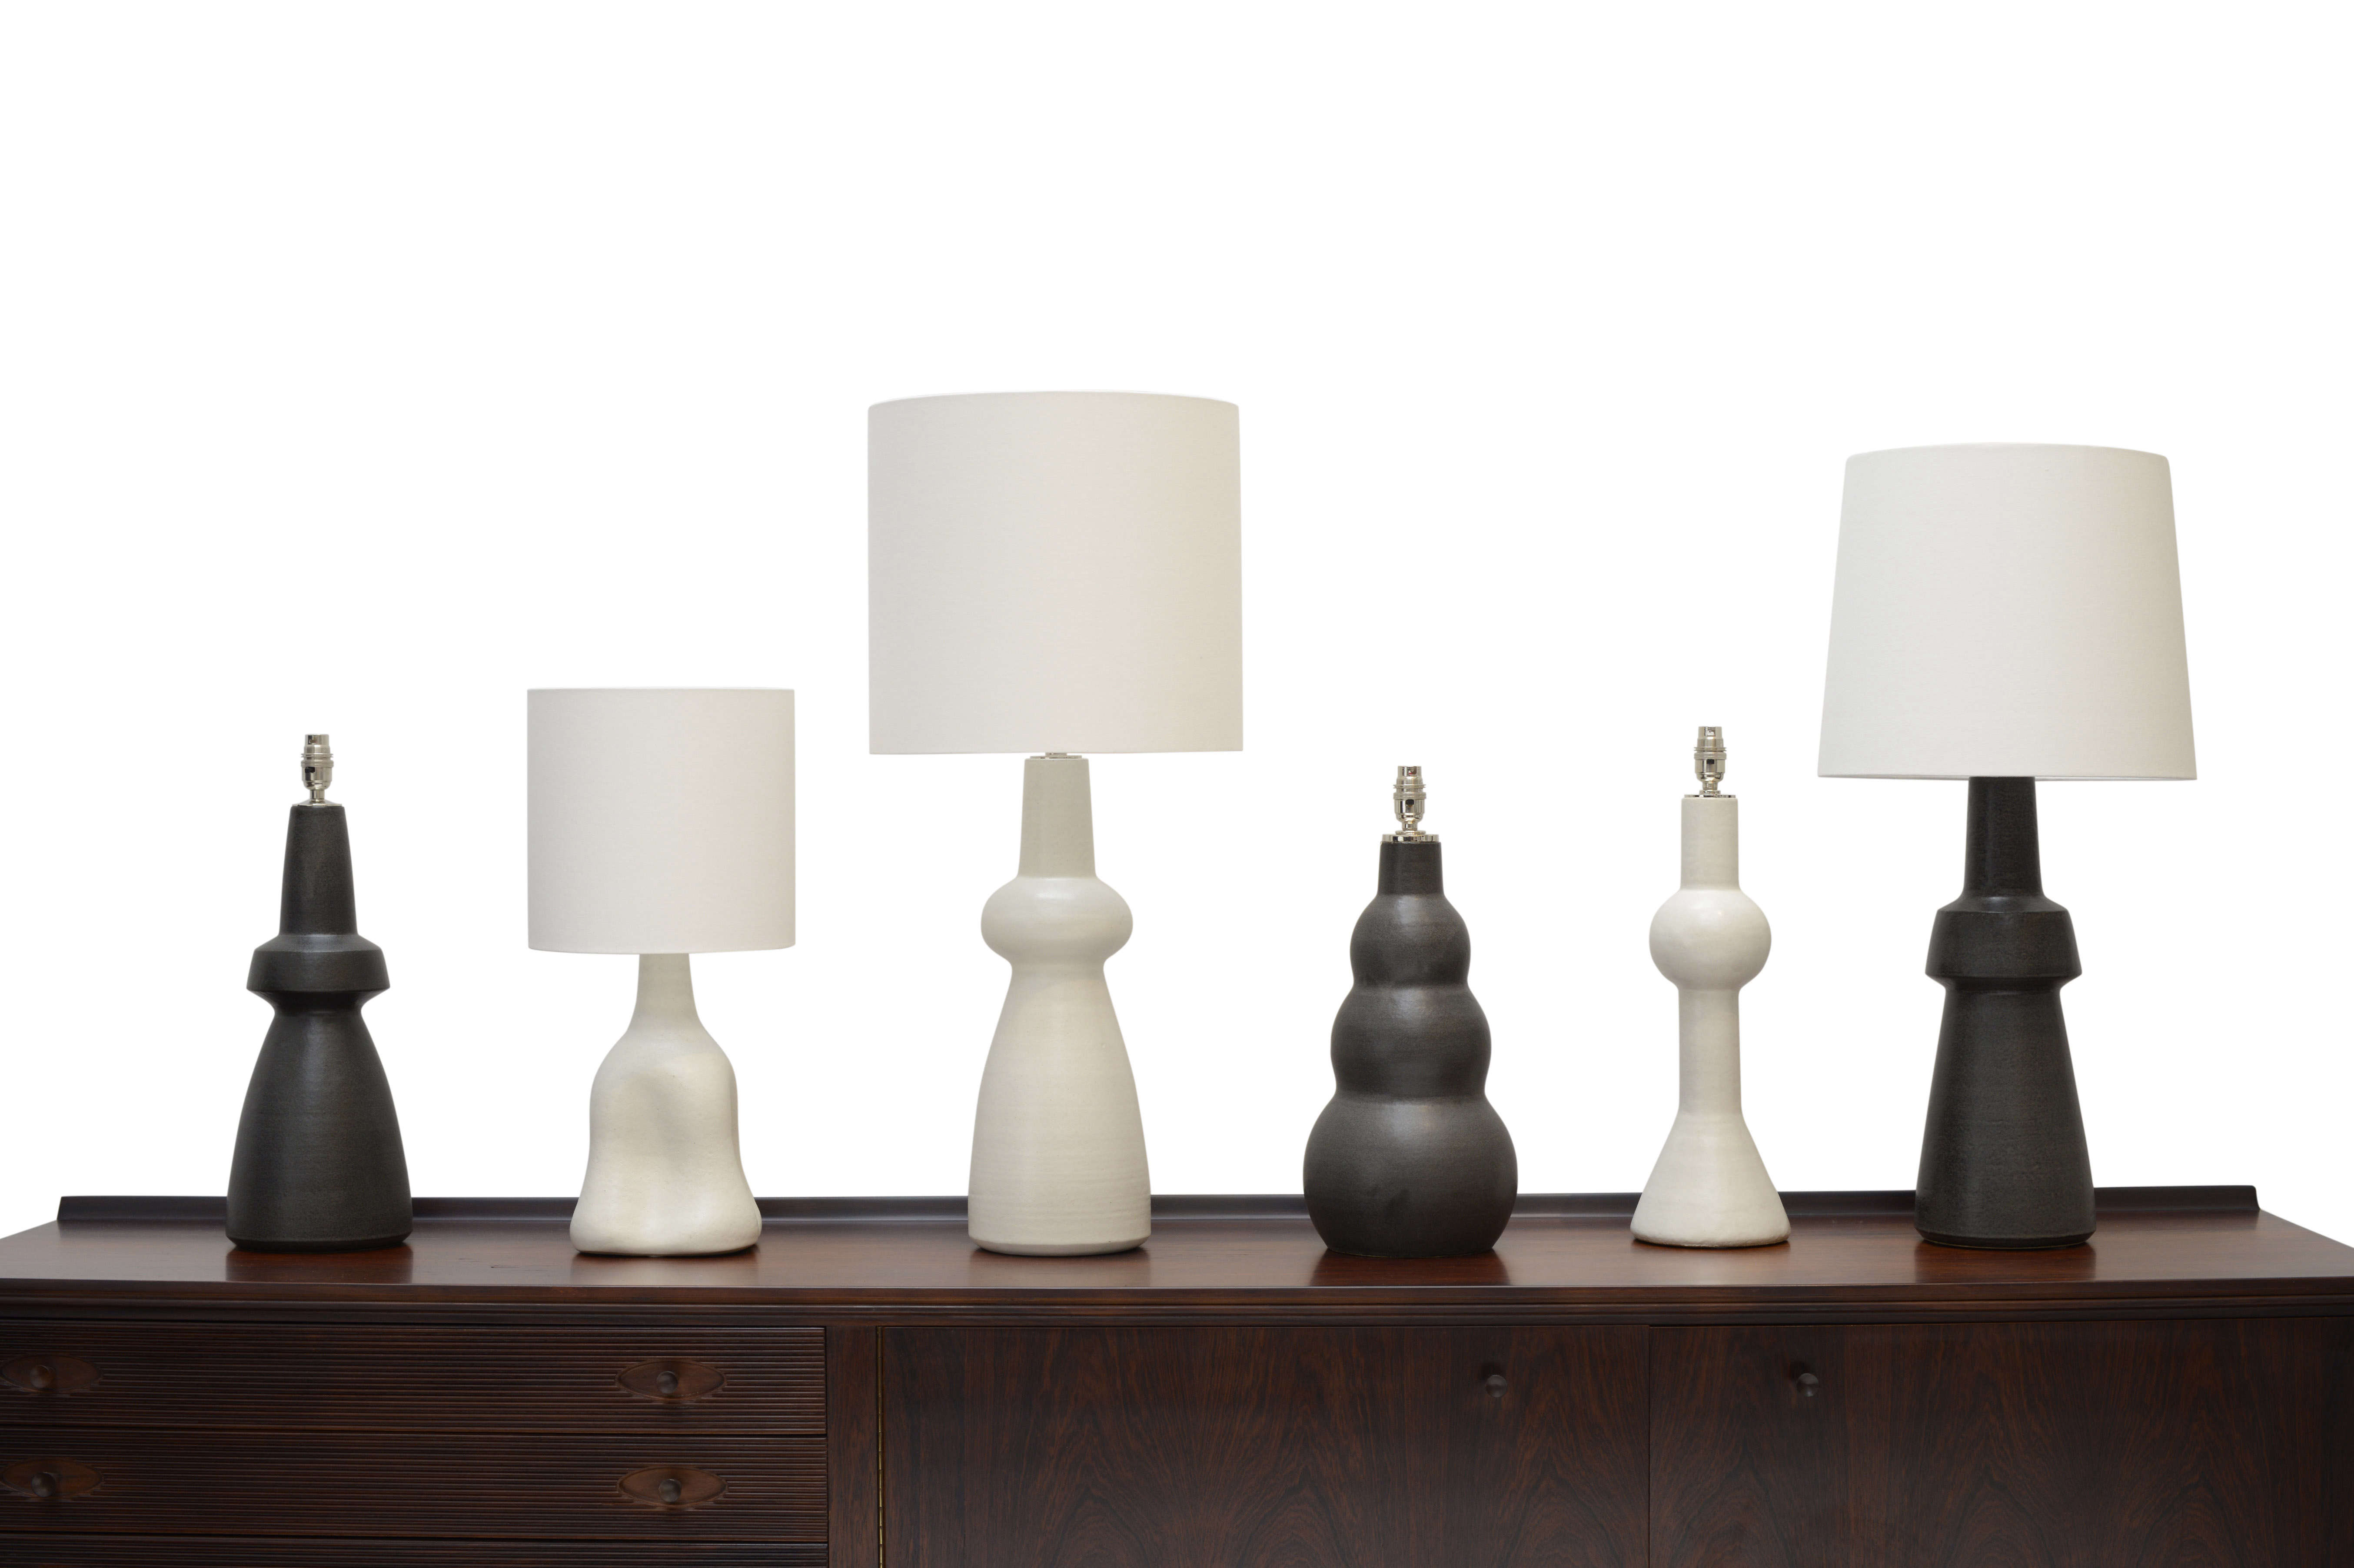 Nicola Tassie Table Lamps at Margaret Howell